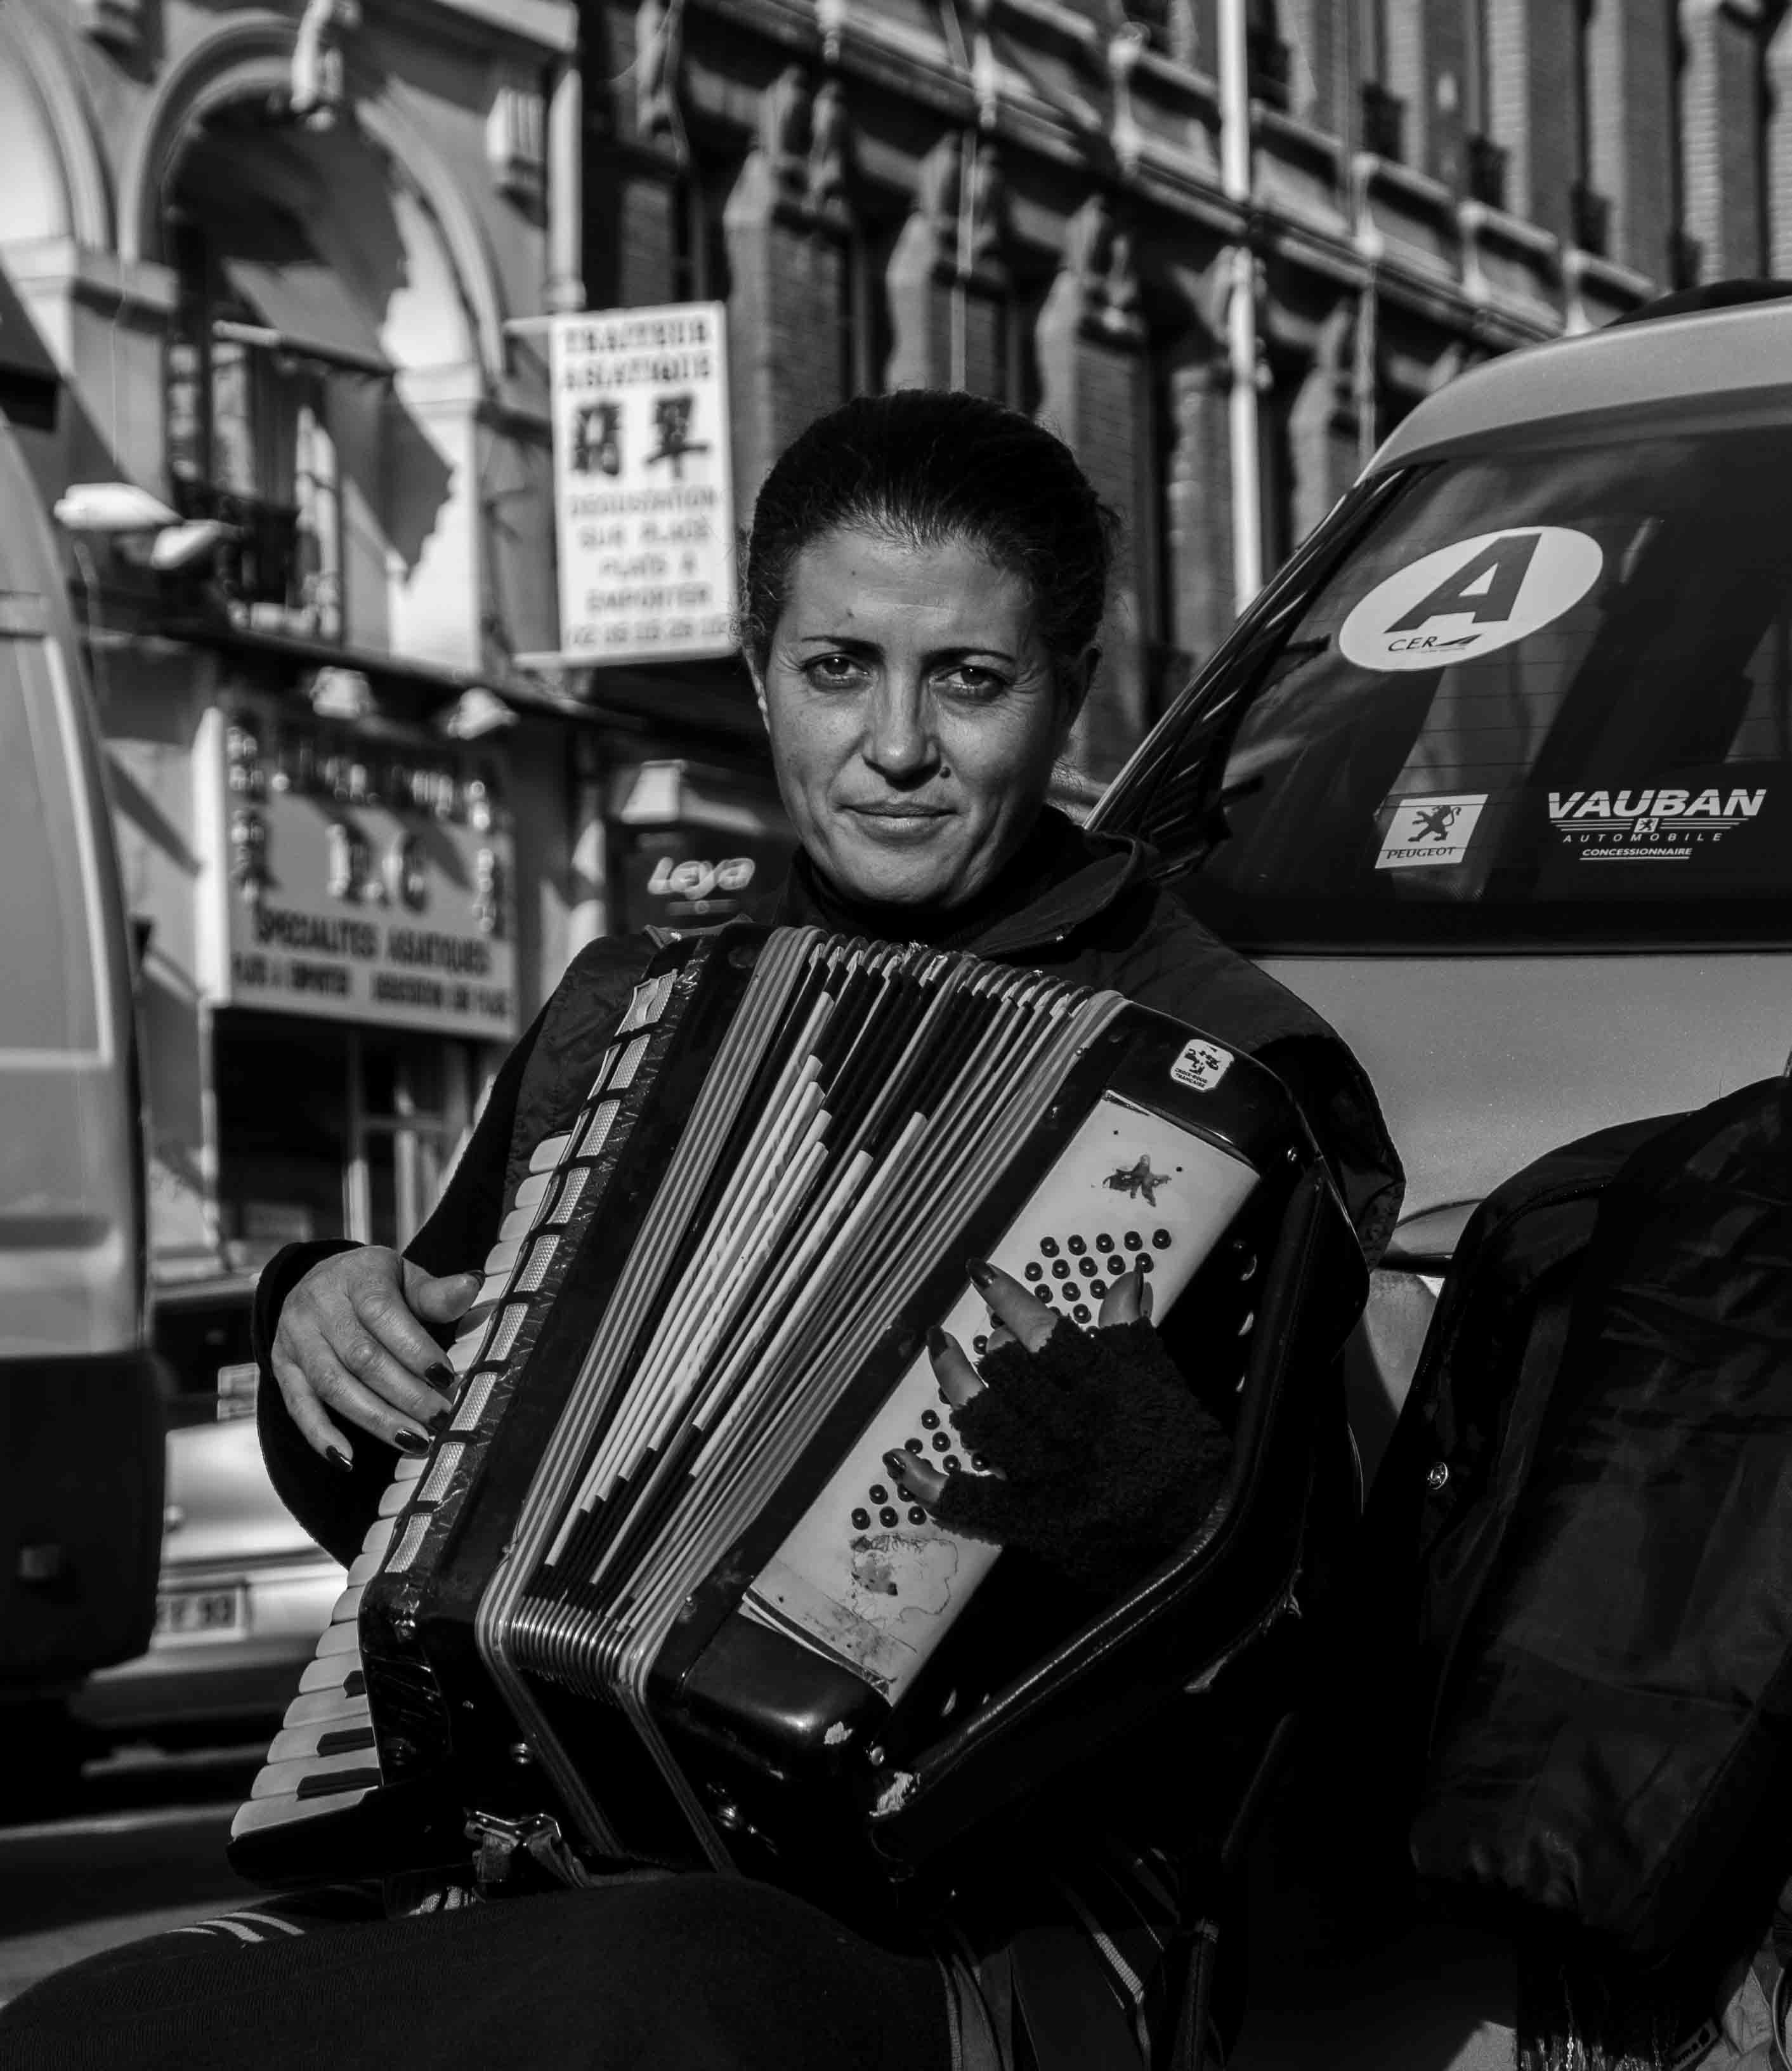 rouen-acordeonist-02-12-12